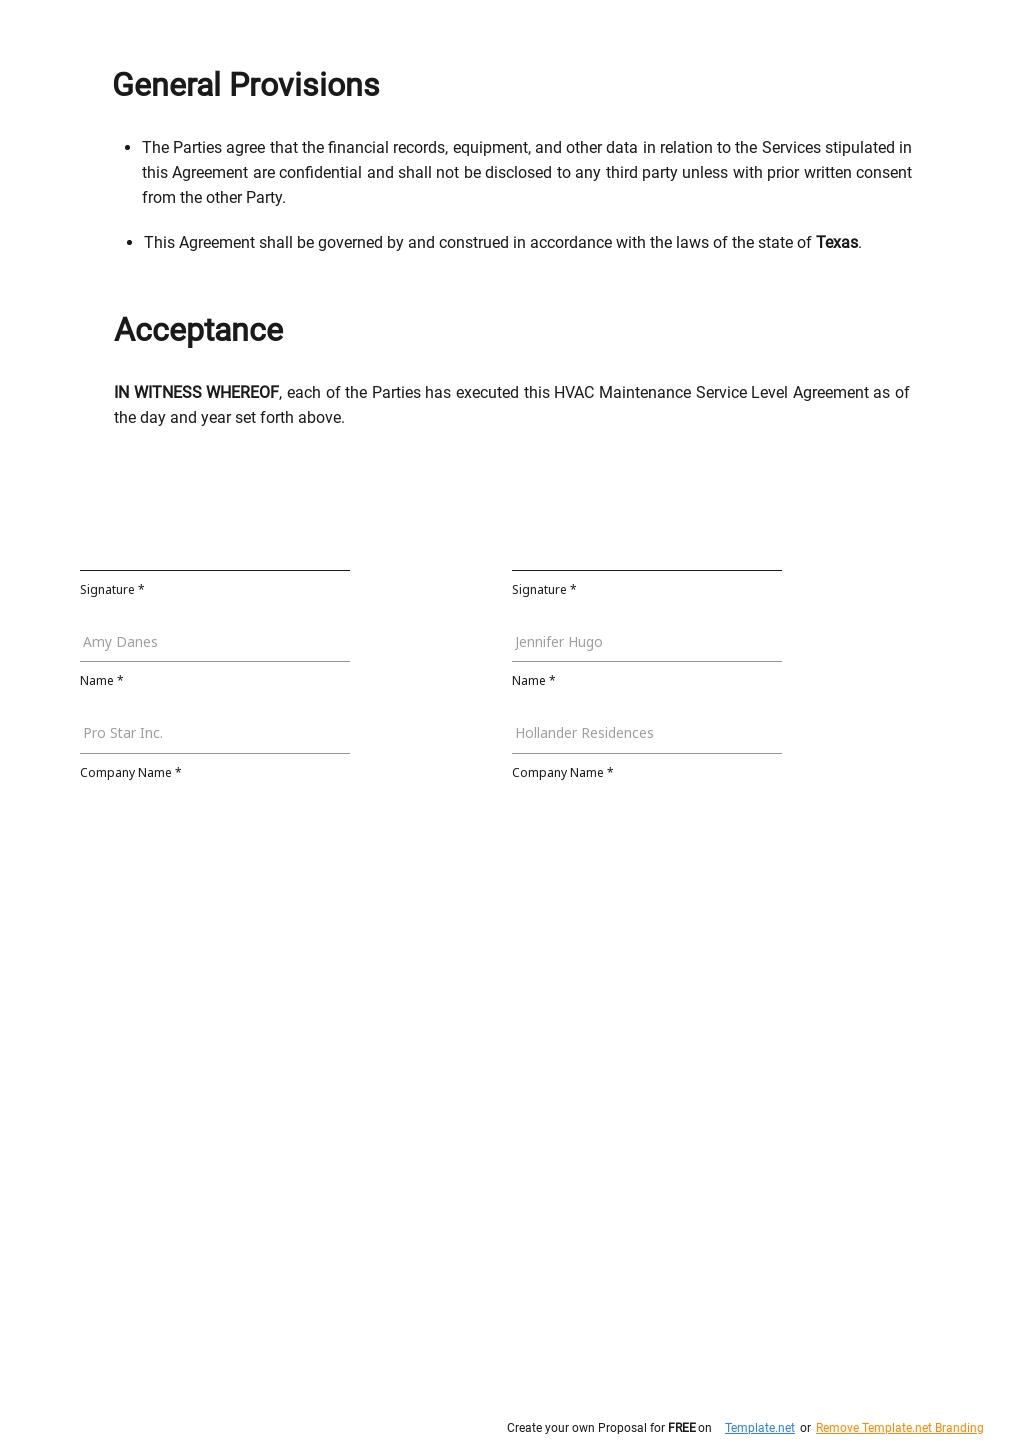 Free HVAC Maintenance Service Level Agreement Template 2.jpe